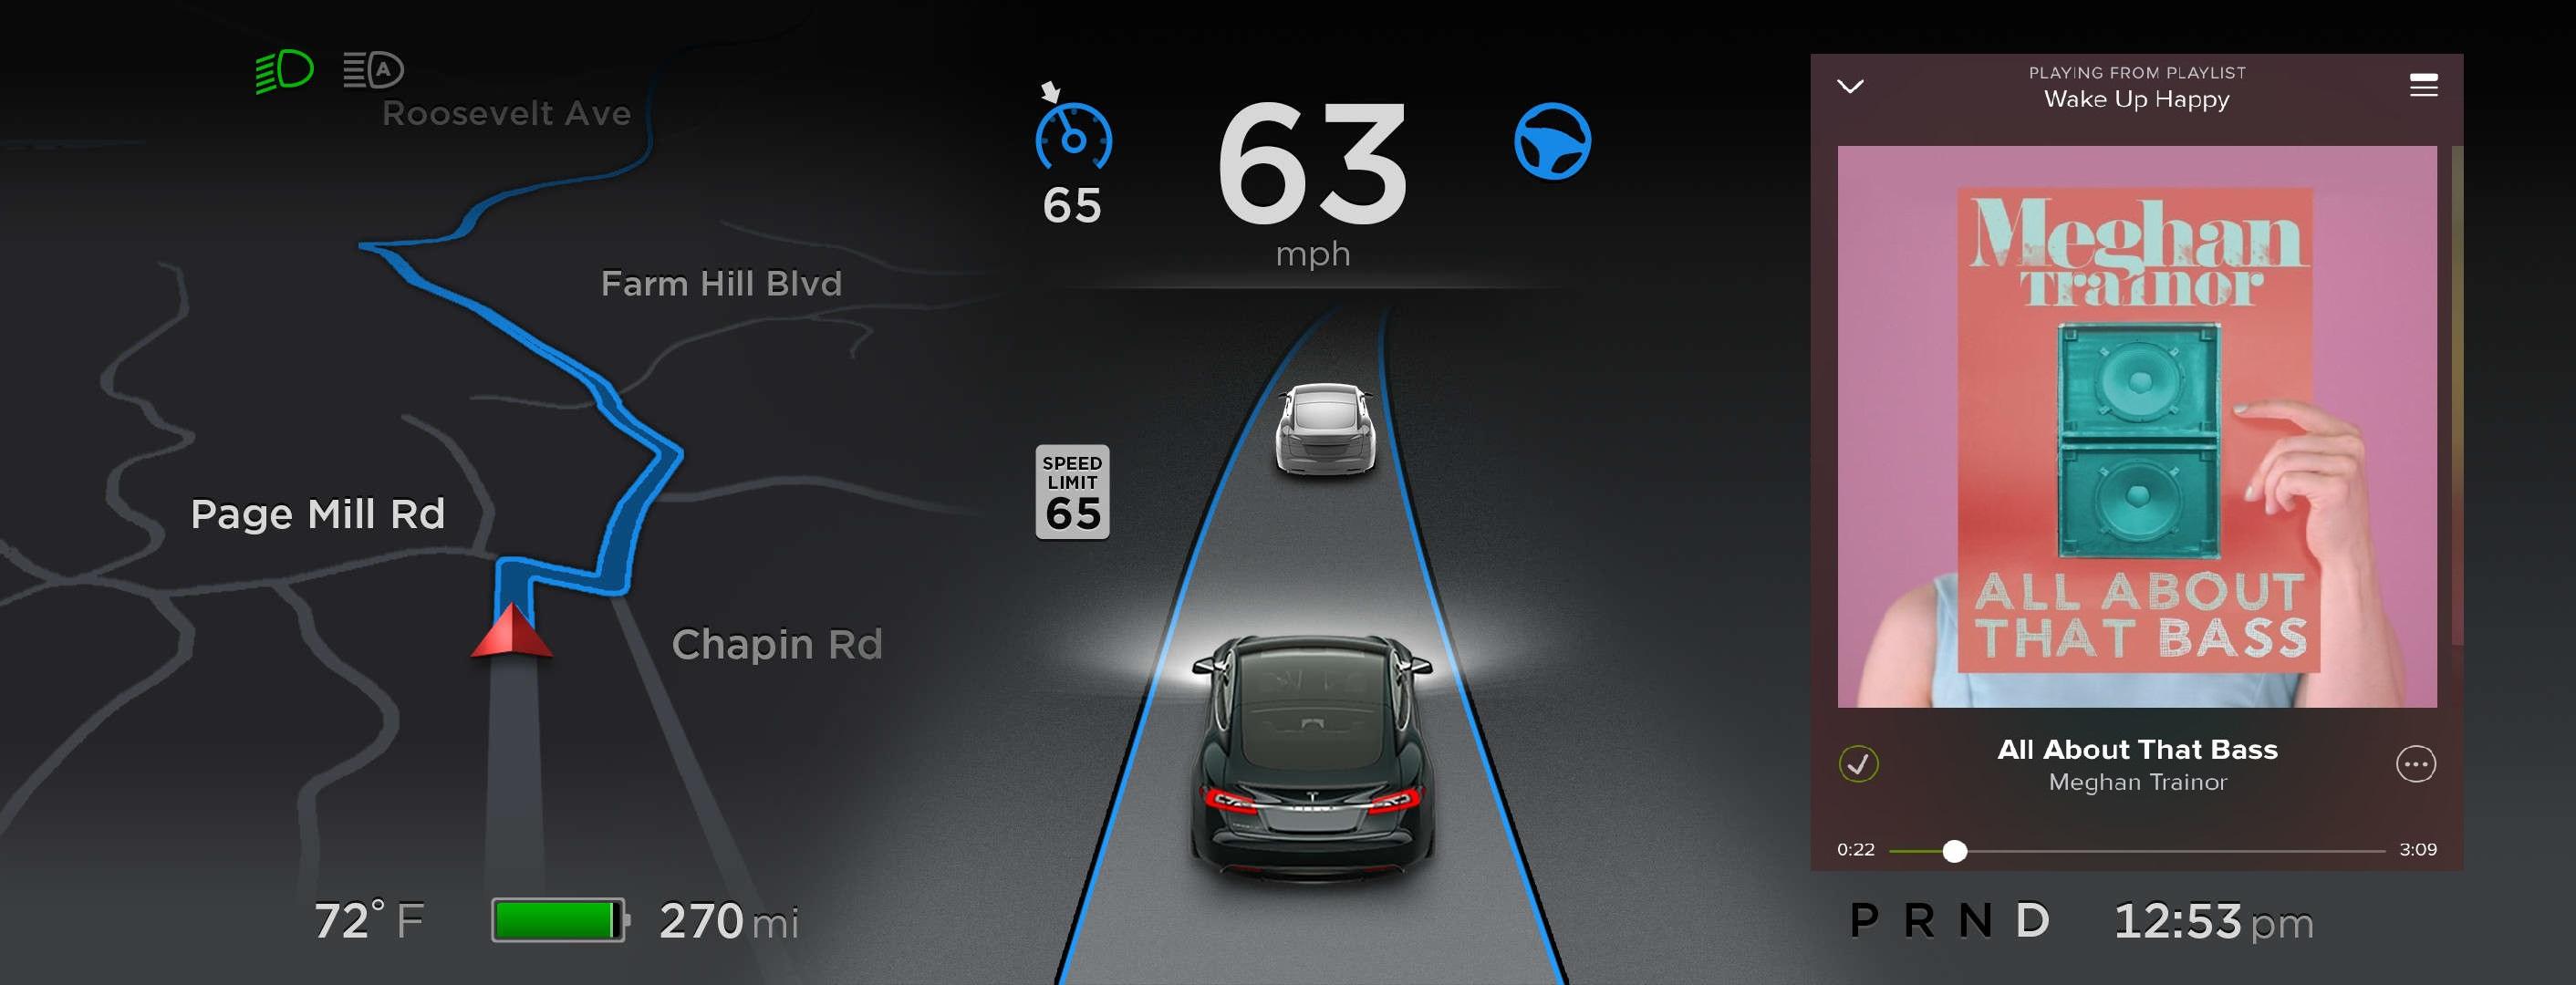 Tesla Spotify